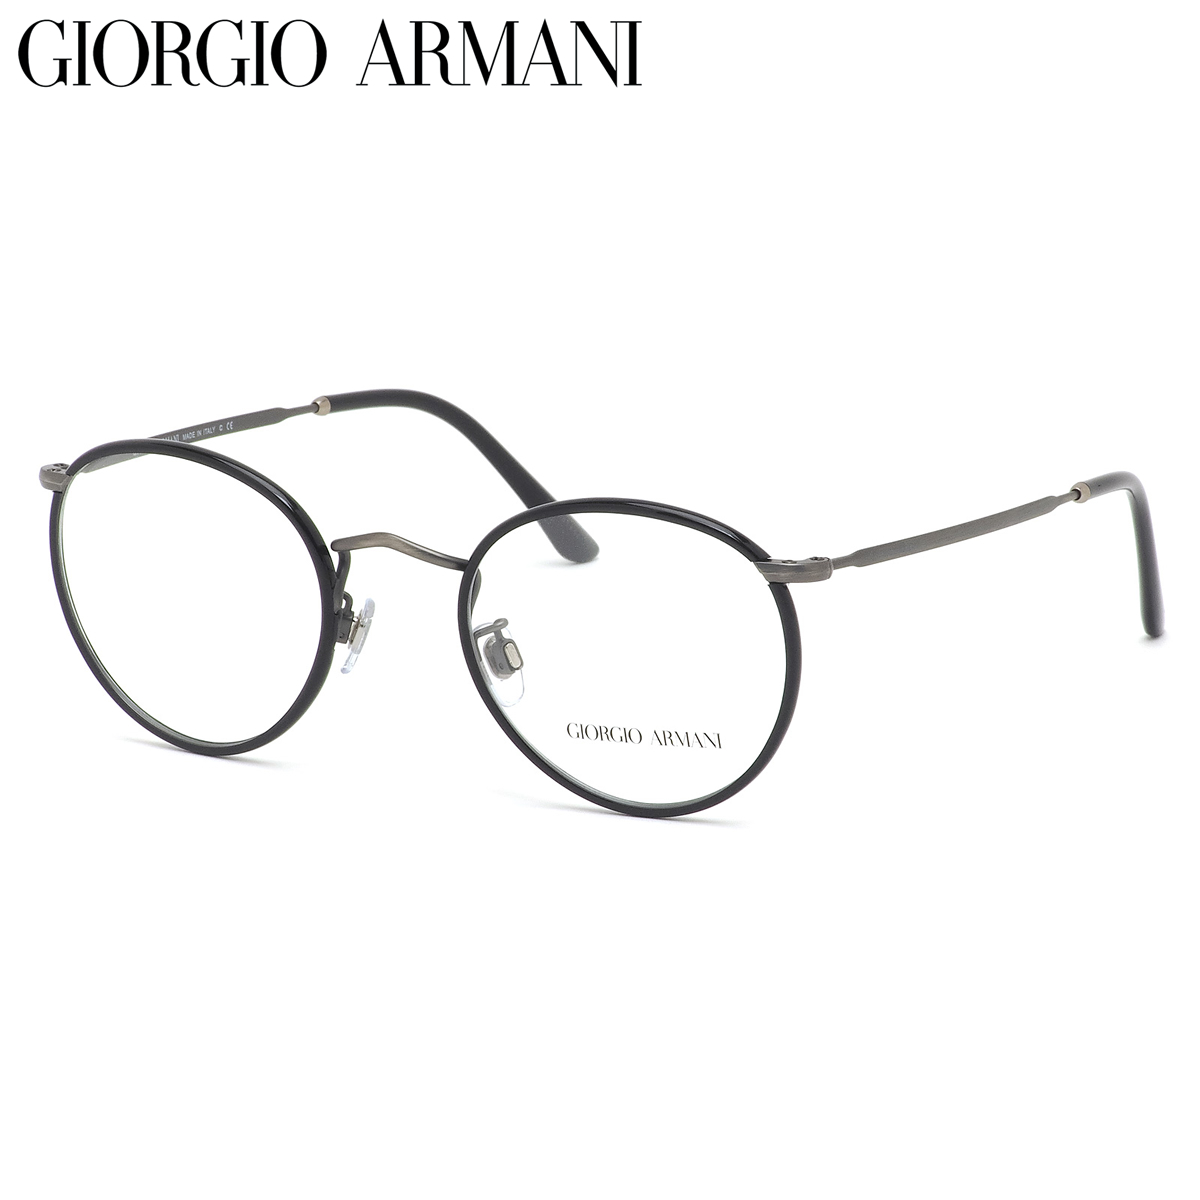 GIORGIO ARMANI ジョルジオアルマーニ メガネ AR112MJ 3260 49サイズ コンビネーション 黒縁 ジョルジオアルマーニGIORGIOARMANI メンズ レディース